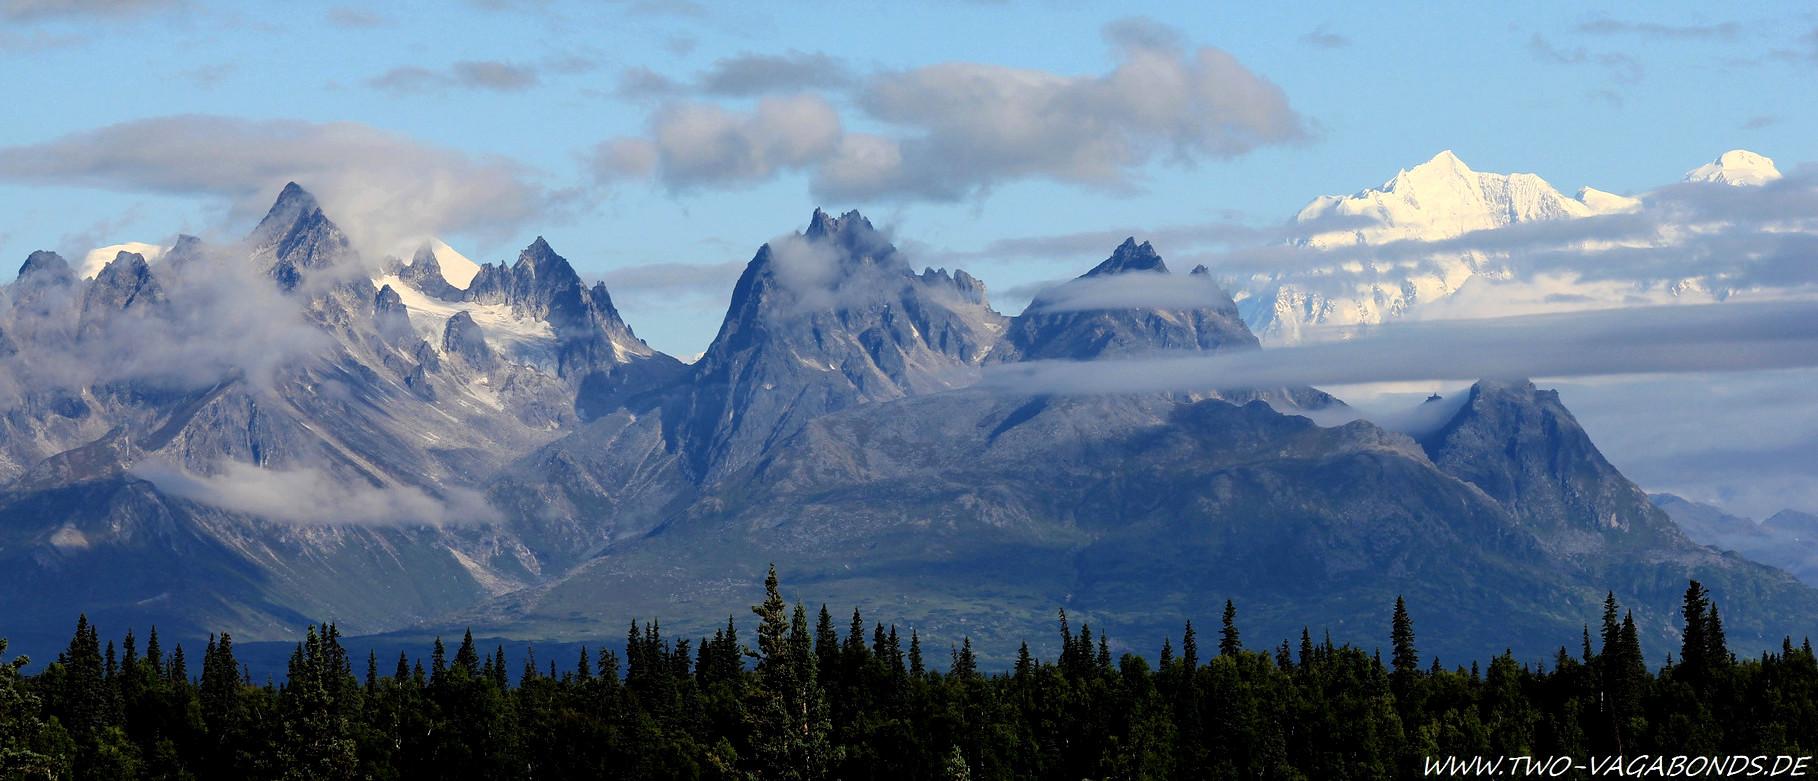 ALASKA 2011 - DENALI NATIONALPARK